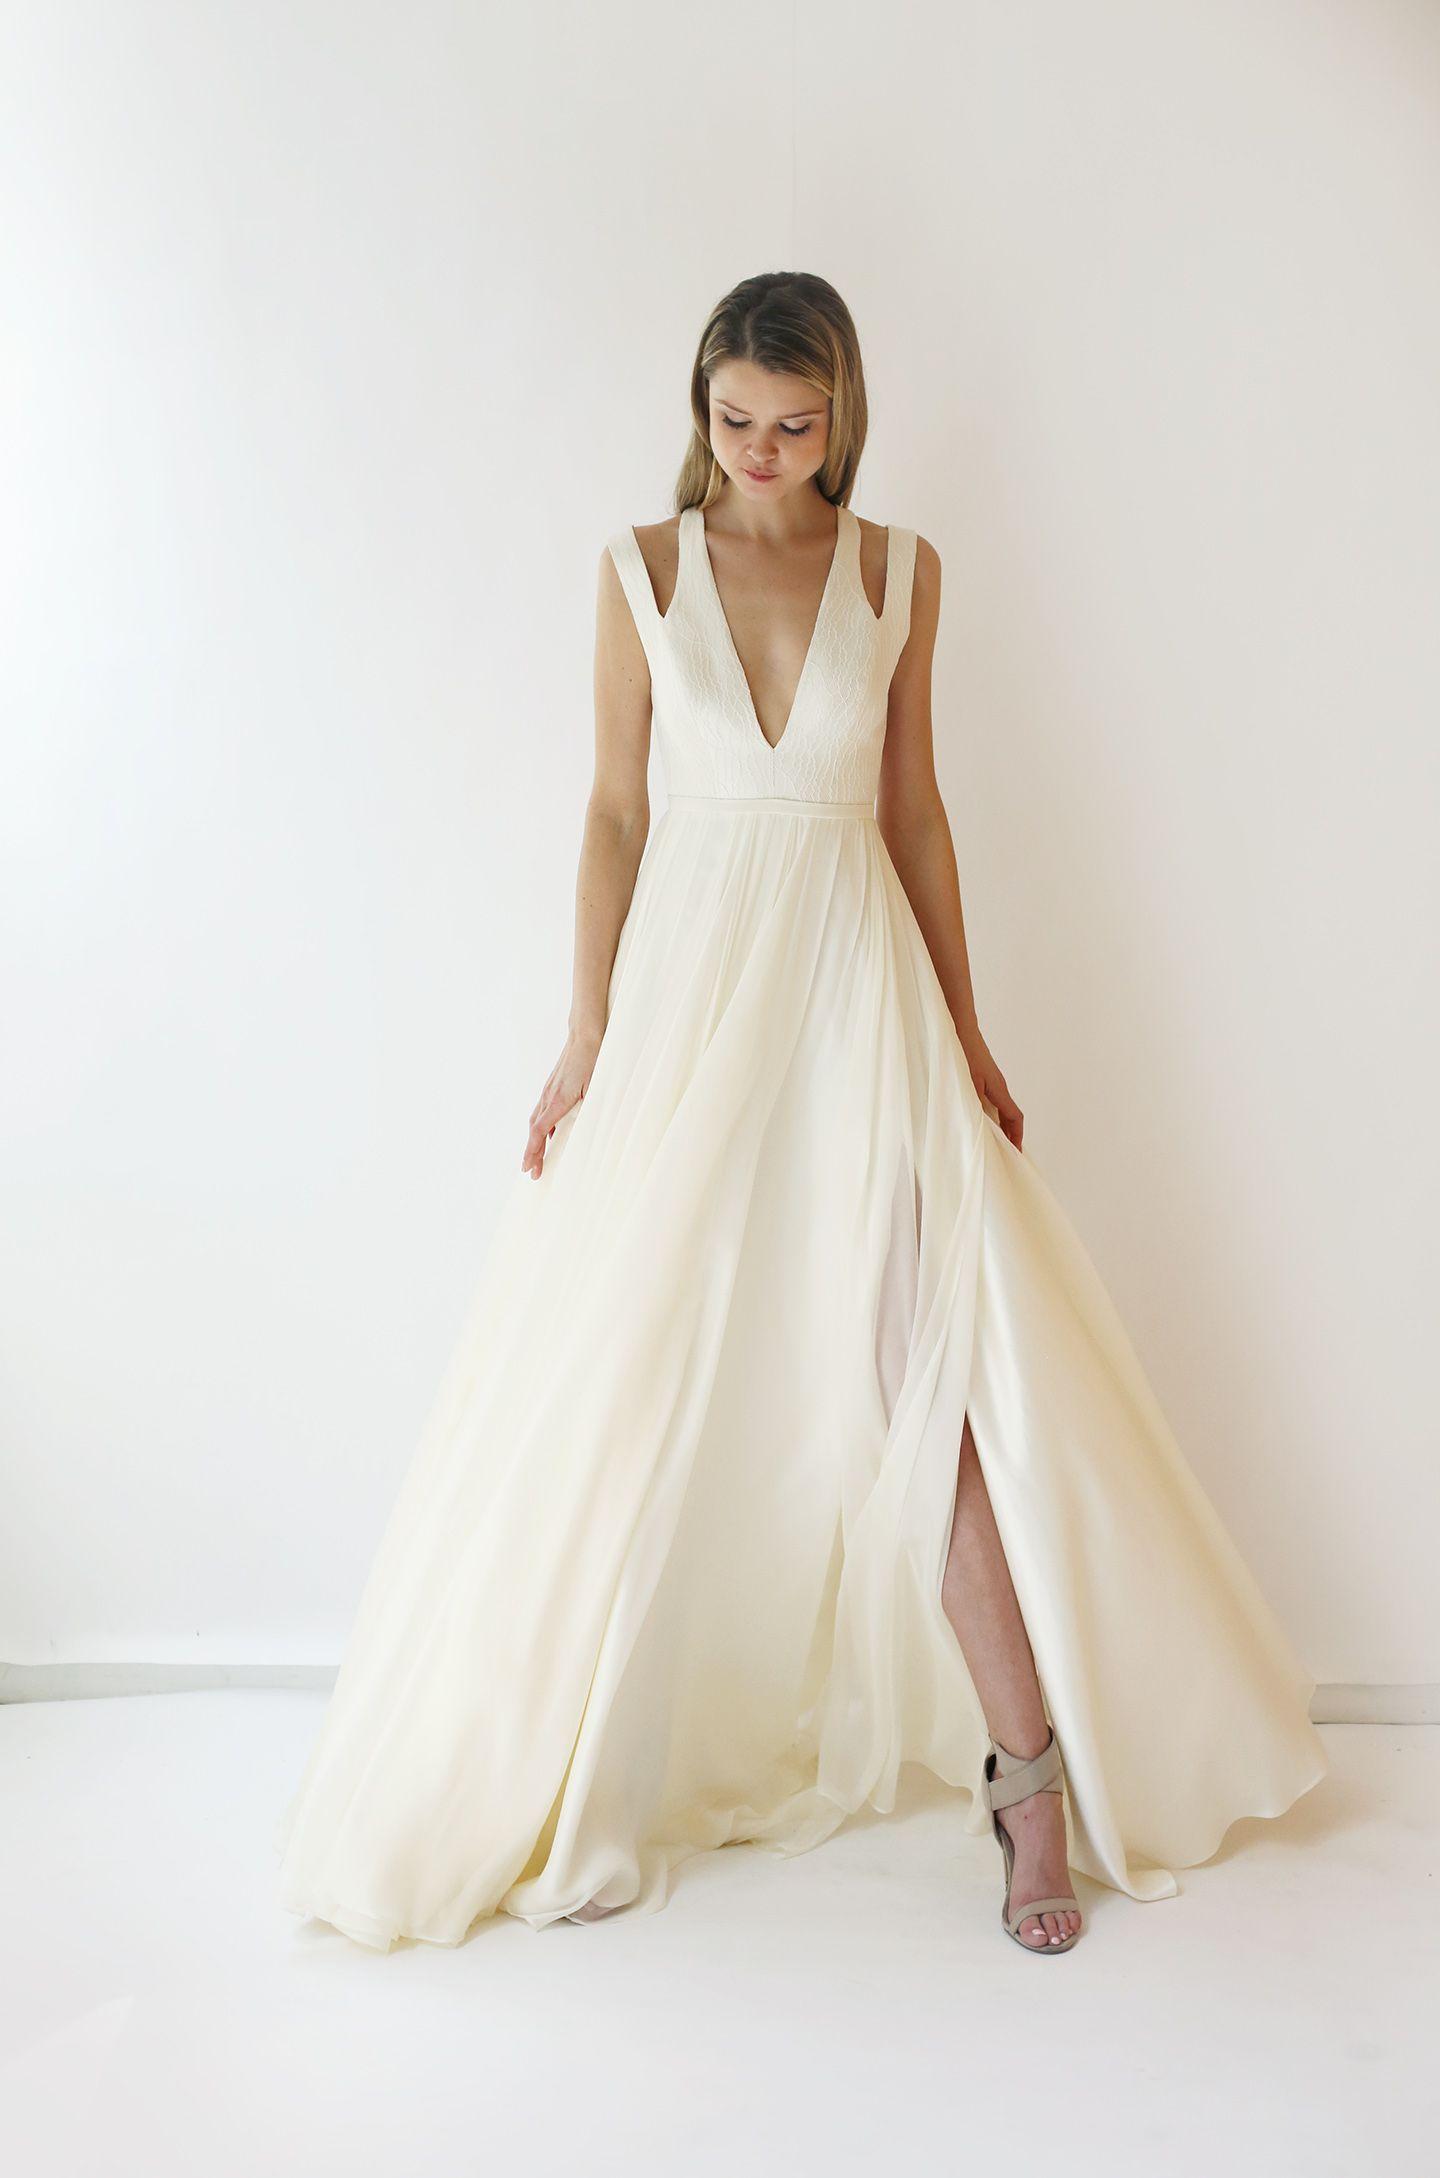 Miranda | Wedding: Dresses | Pinterest | Leanne marshall, Unique ...